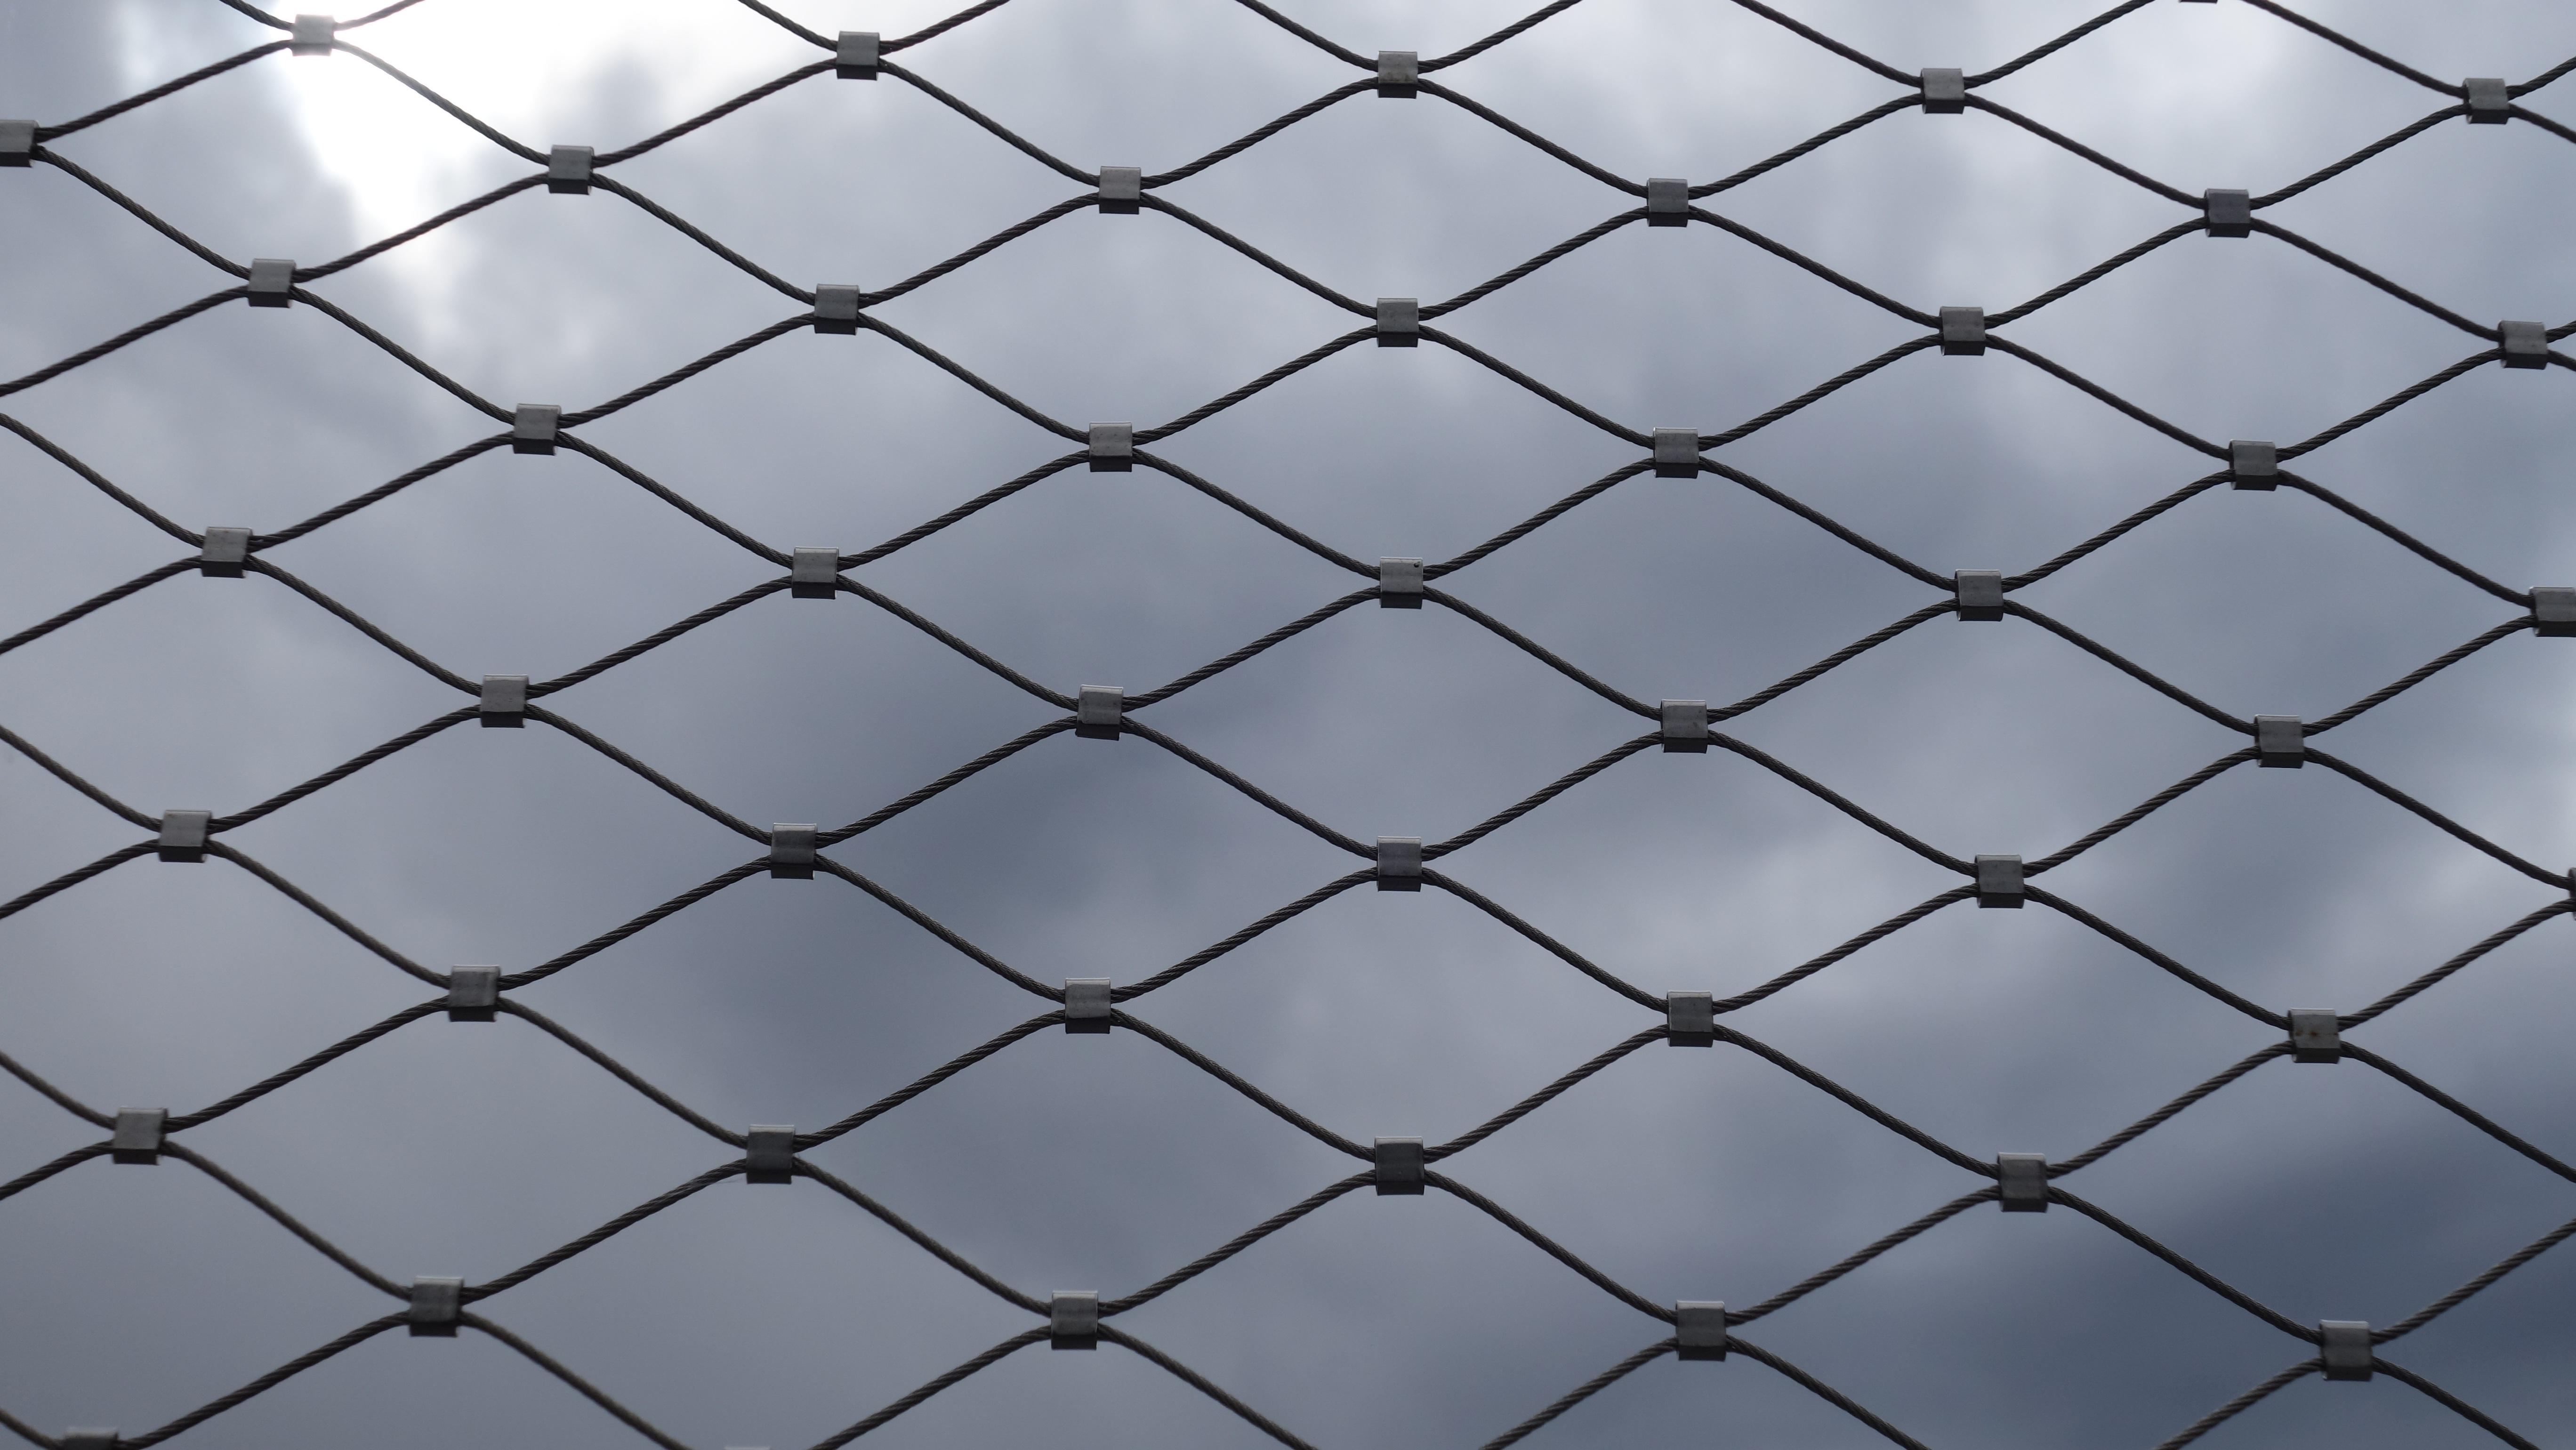 metal floor texture. Technology Texture Floor Wall Wire Railing Pattern Line Geometry Metal Material Circle Art Lines Net Mesh